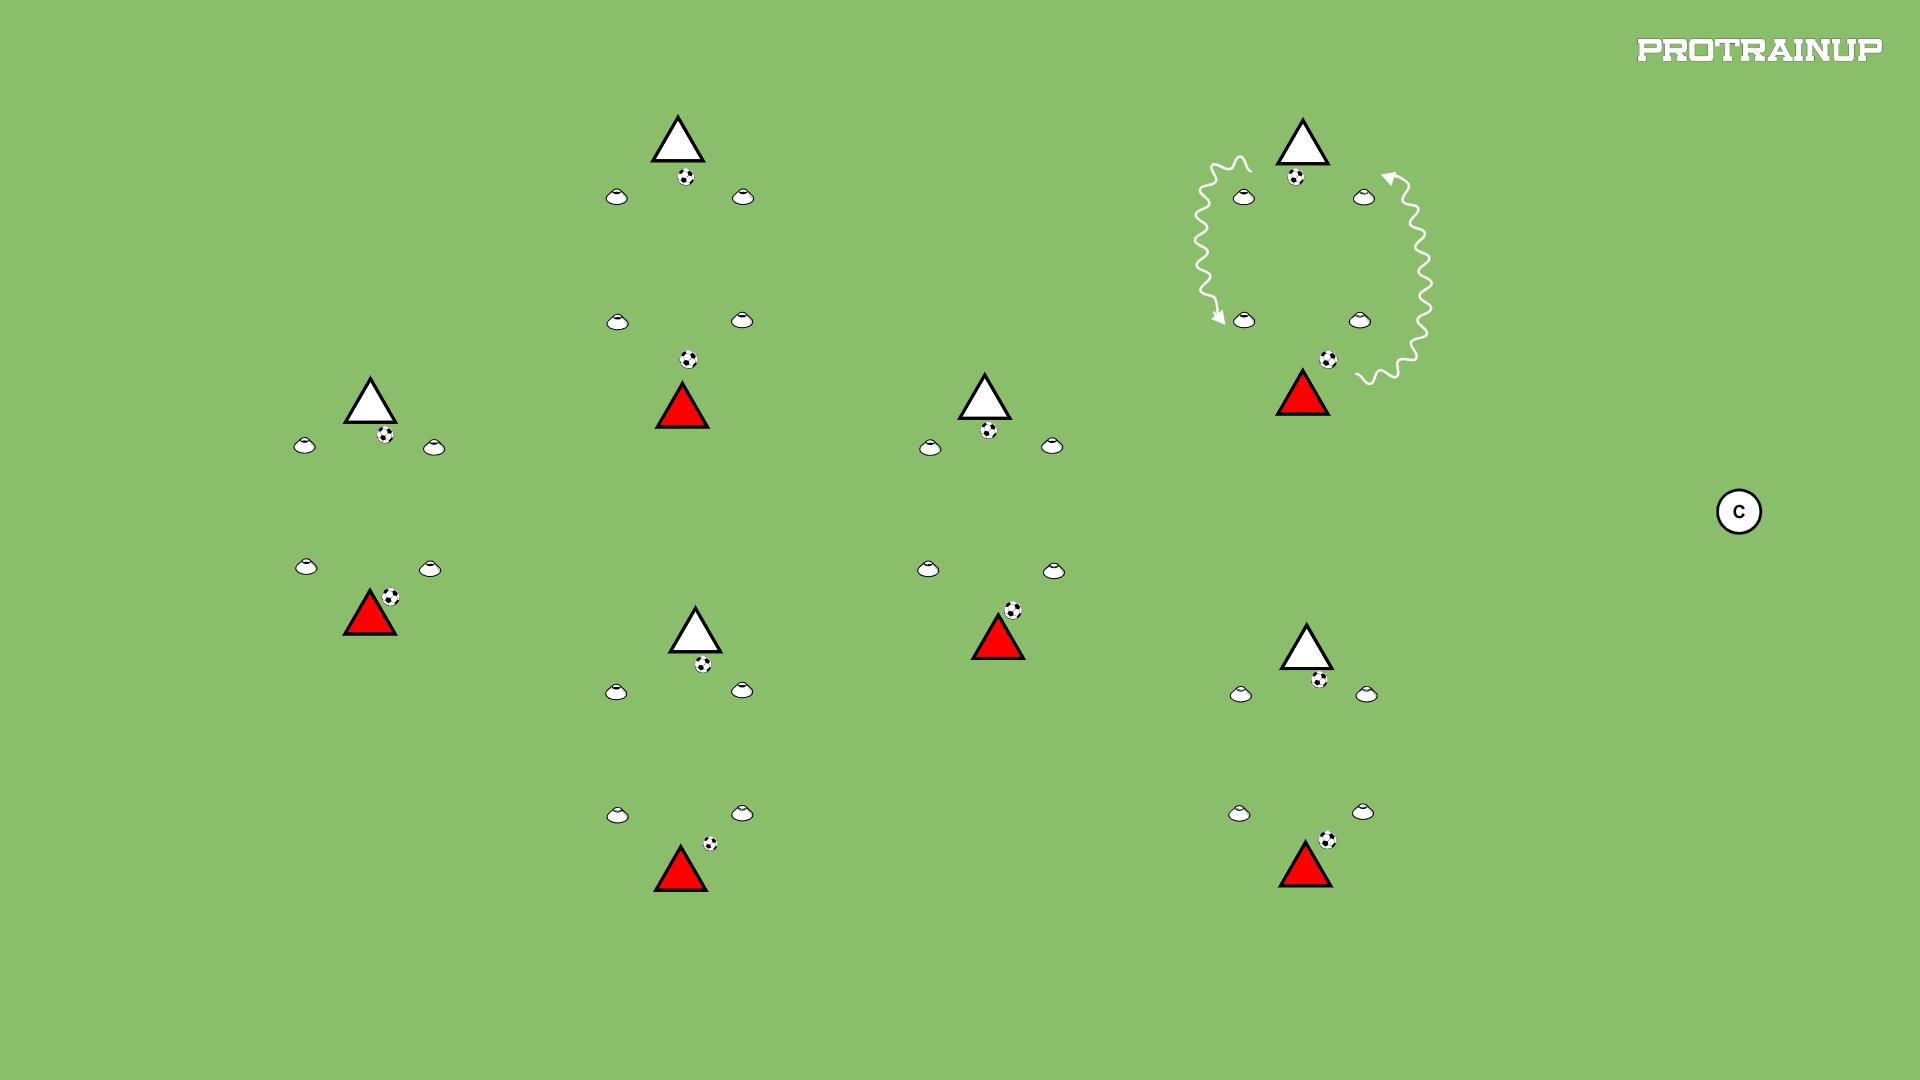 Złap partnera z piłkami - kwadrat A